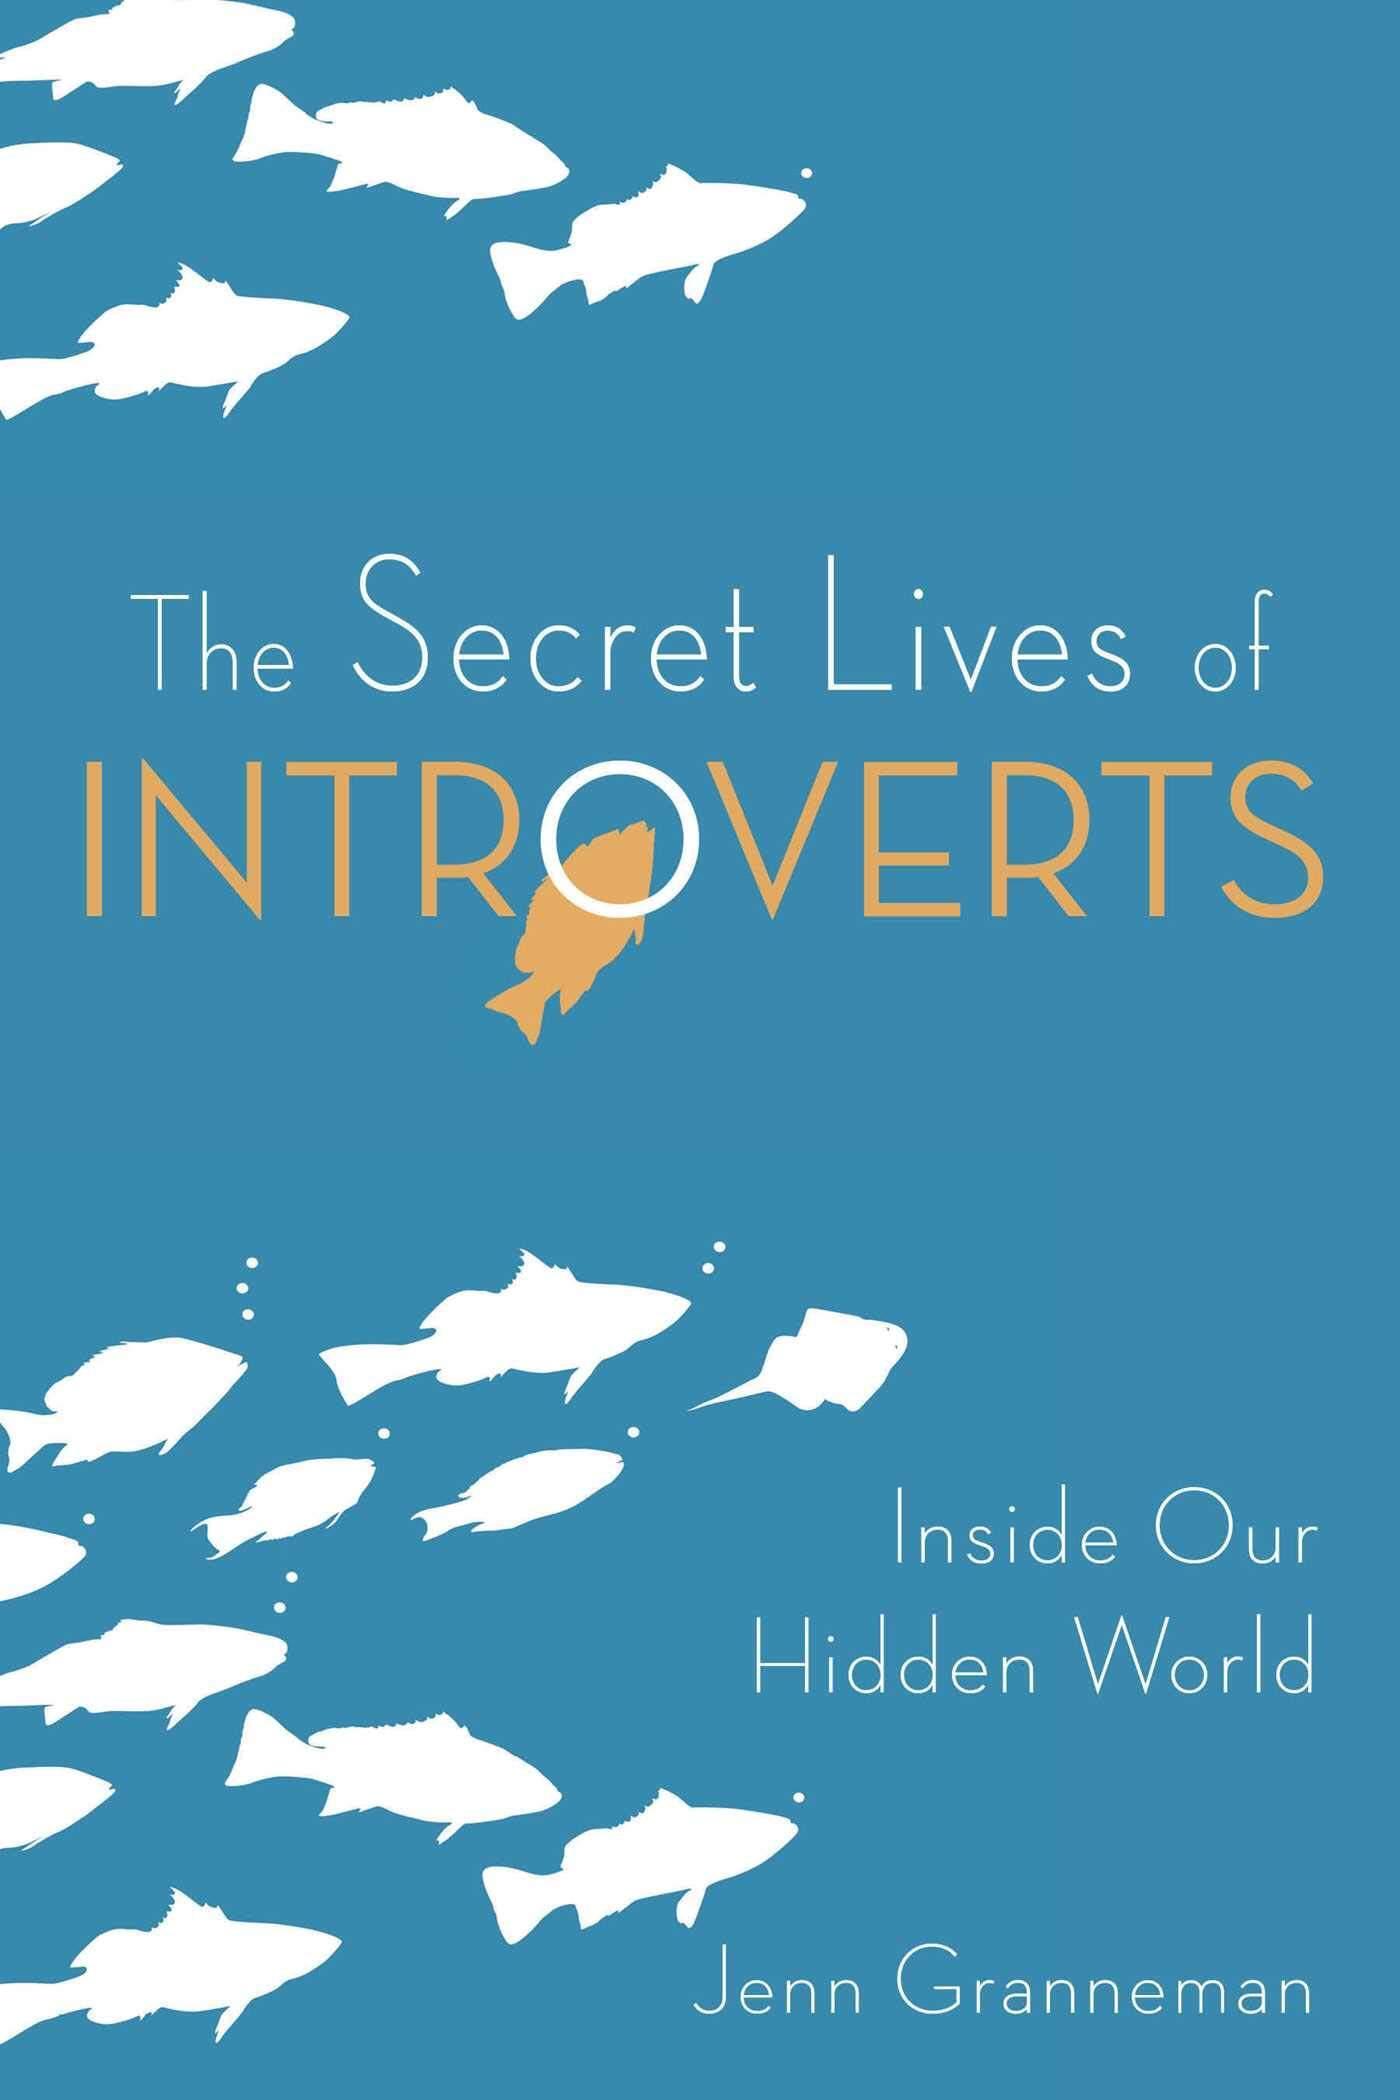 [eBook] The Secret Lives of Introverts - Inside Our Hidden World